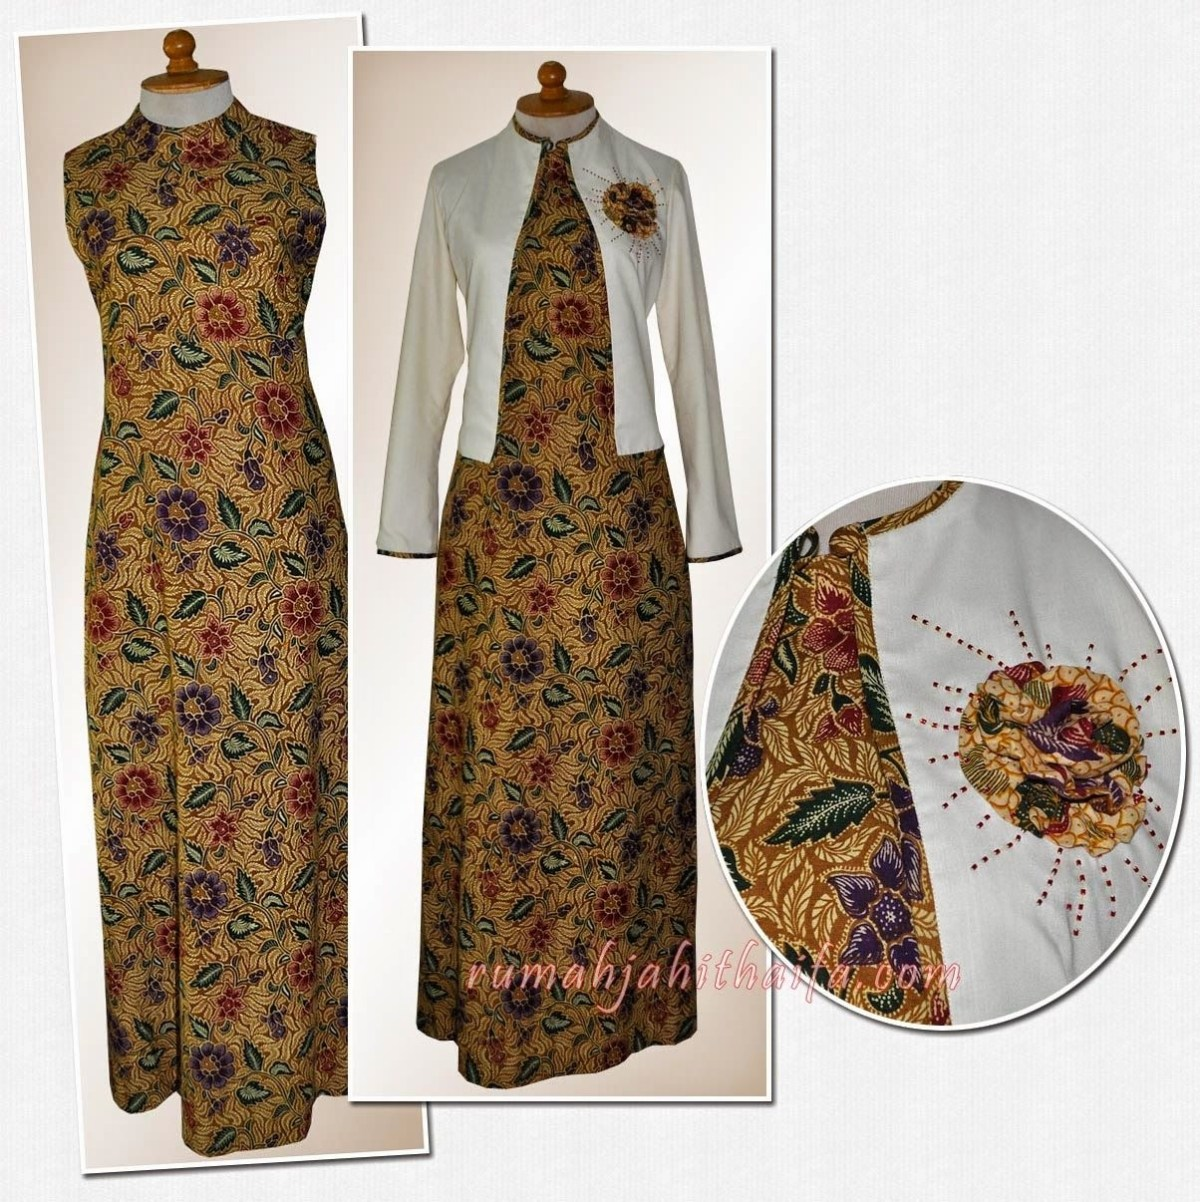 ❤️ Kumpulan Model Gamis Batik Kombinasi Satin Yang Wajib Anda